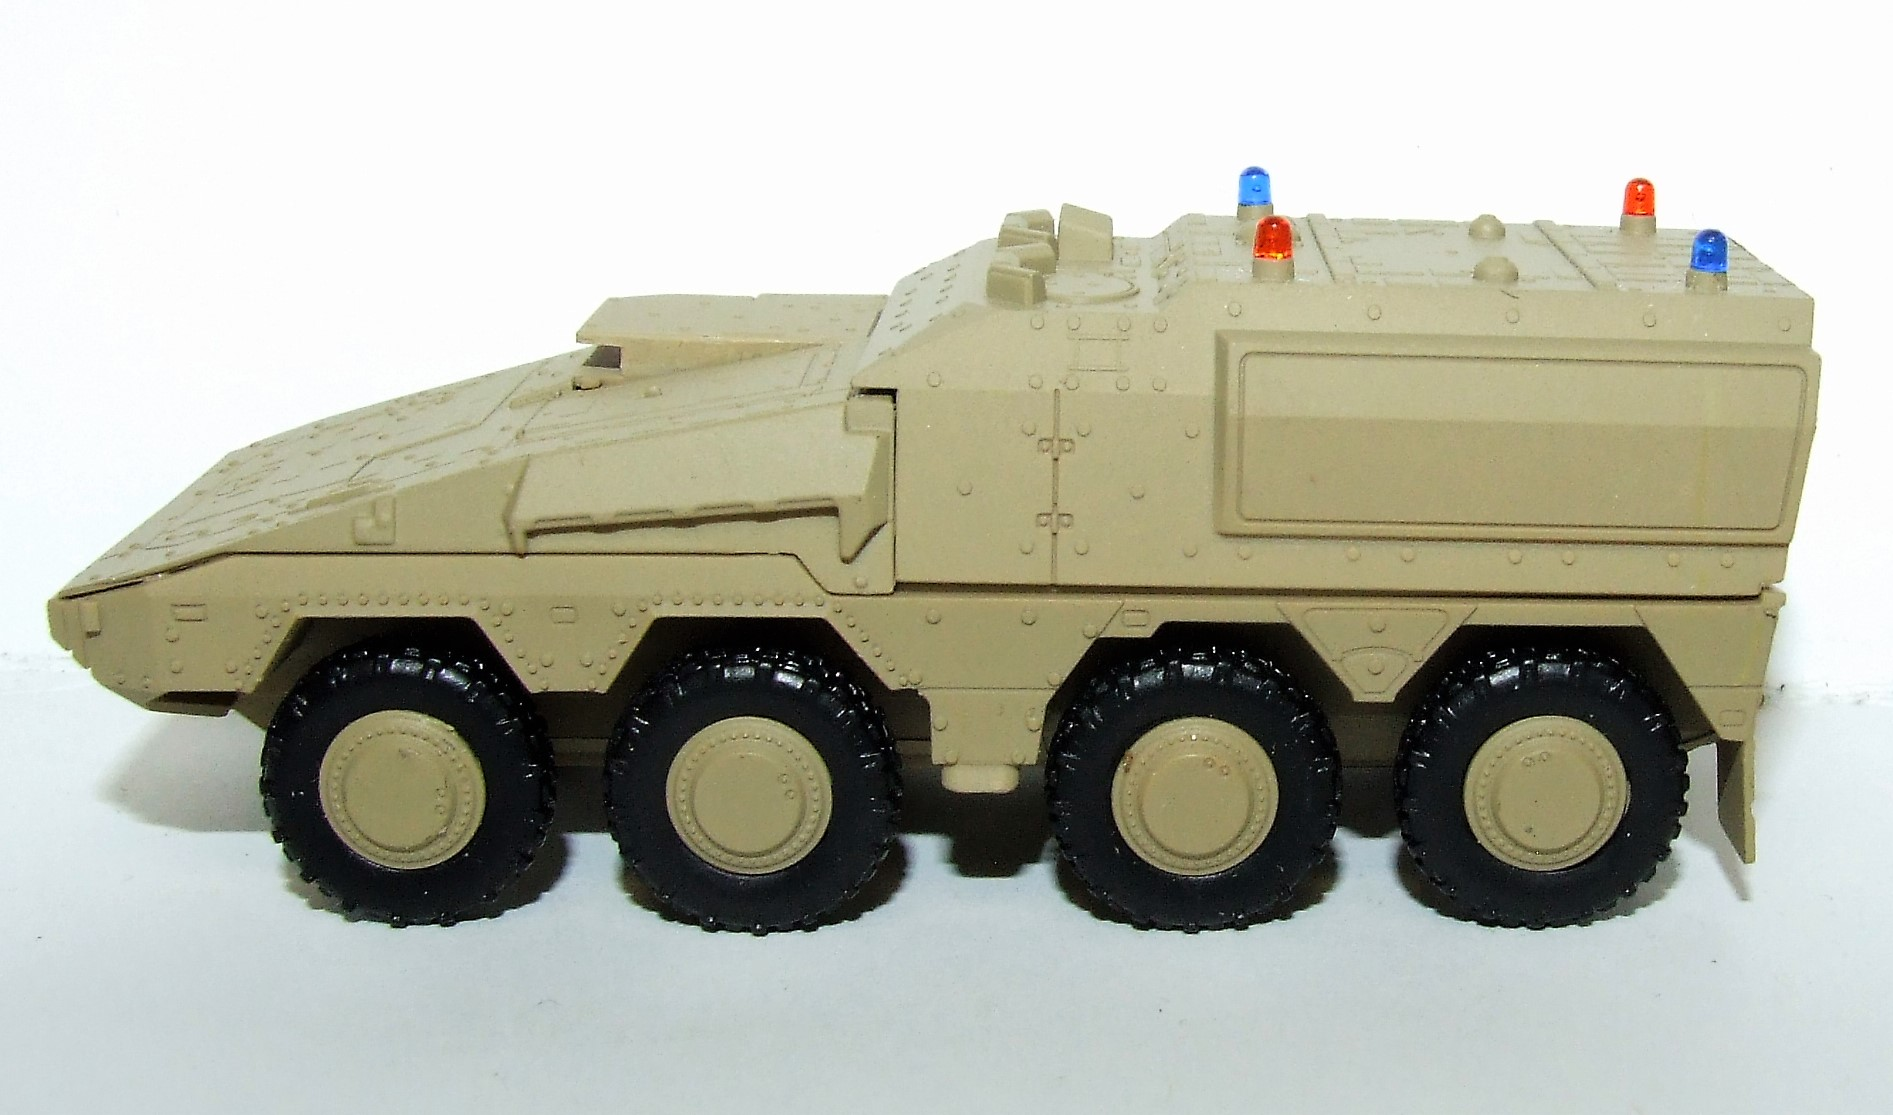 Herpa Military 745147 GTK Boxer Sanitätsfahrzeug, undekoriert (sandbeige) 1:87